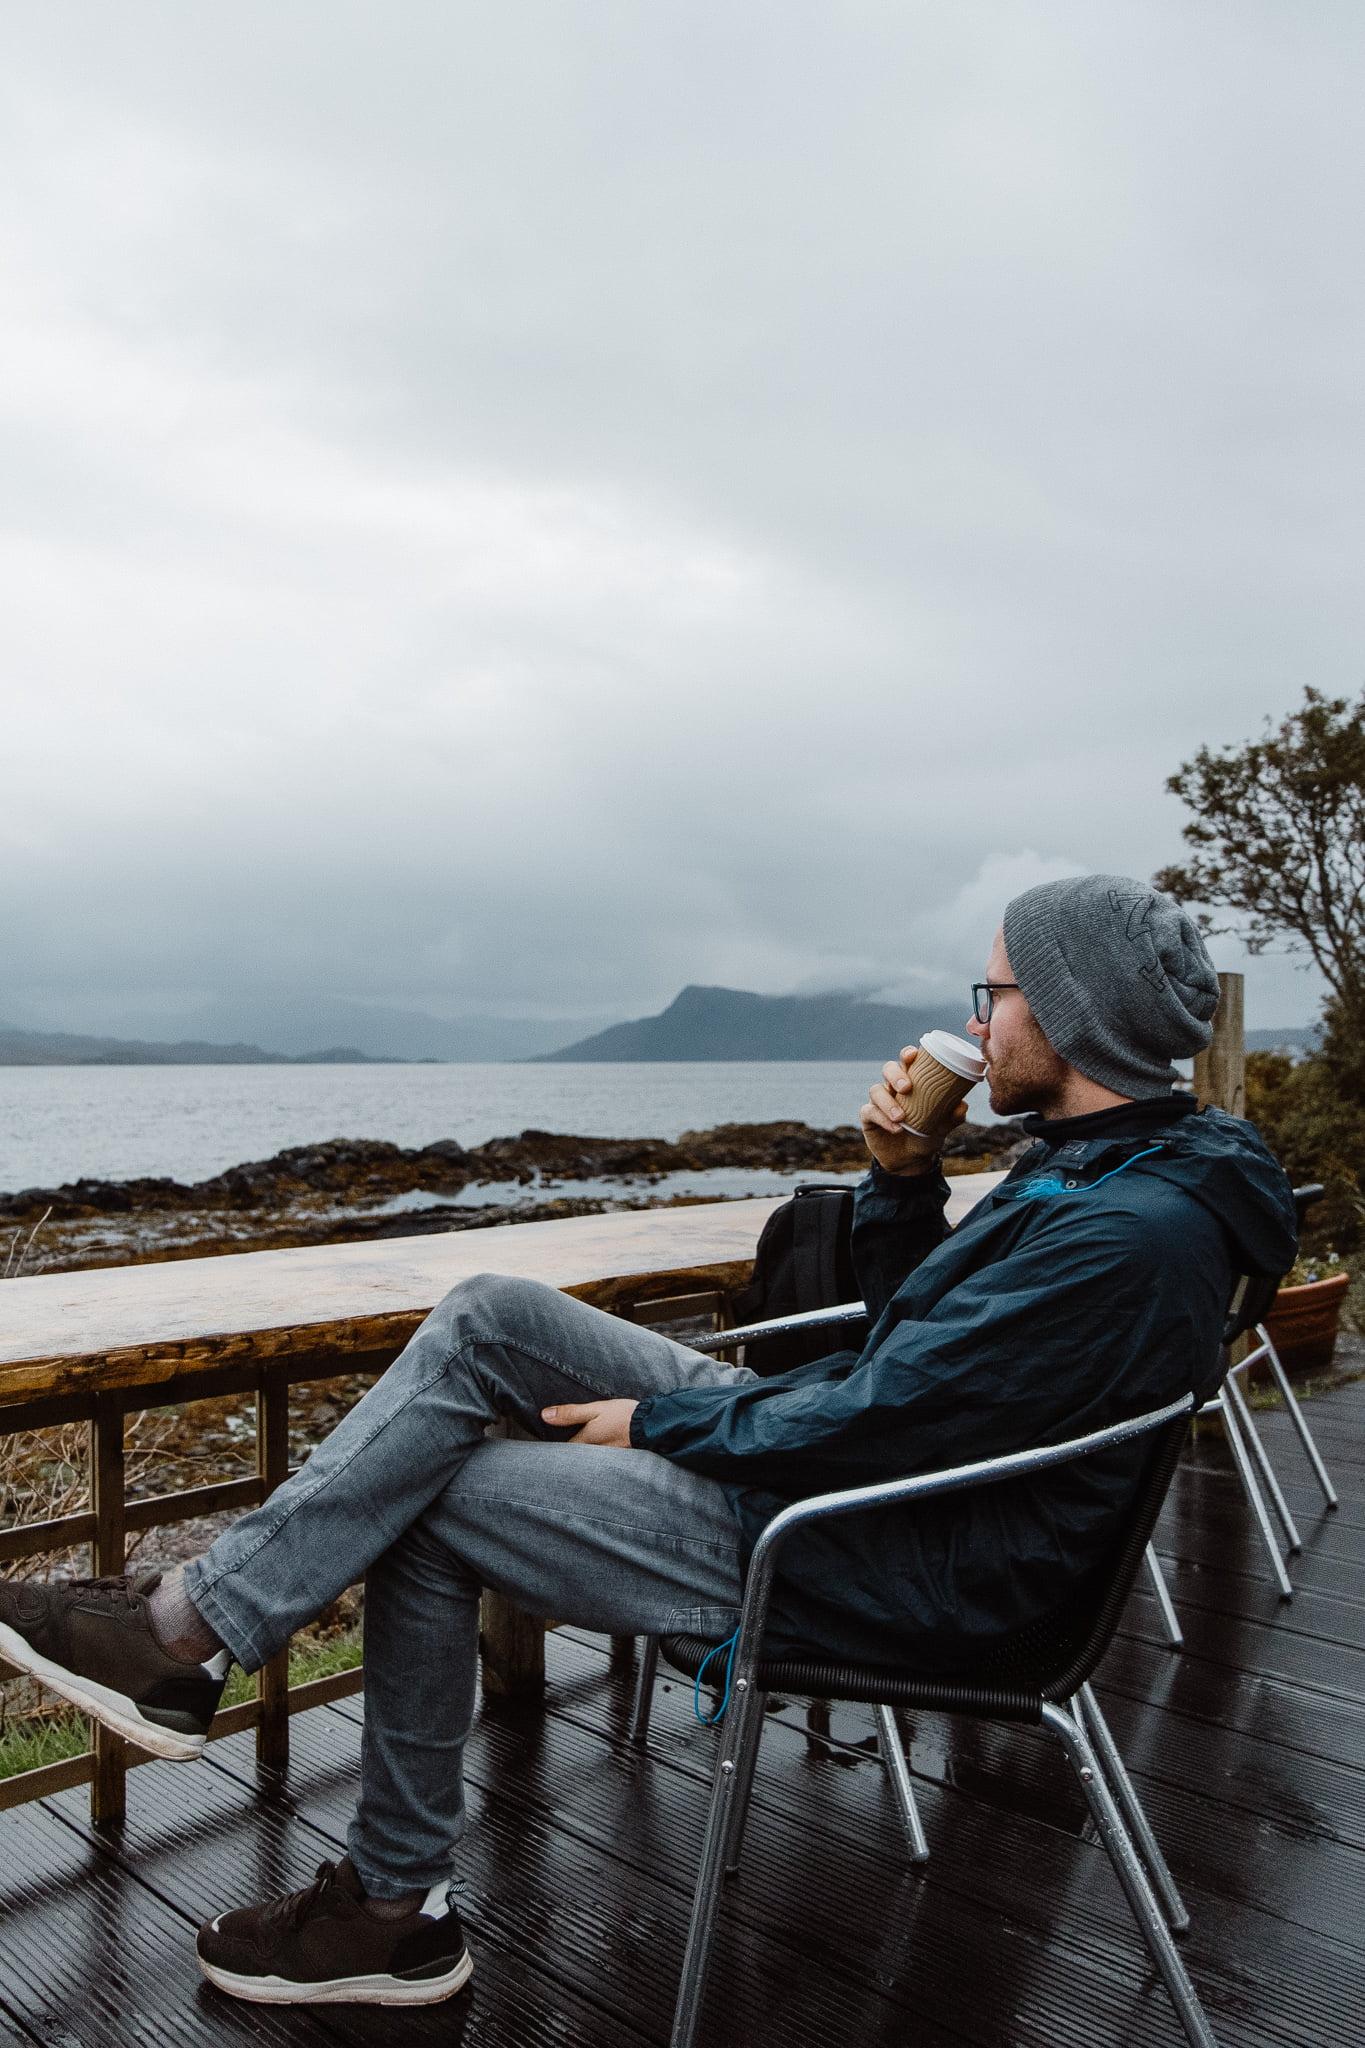 Scotland portrait photographer, Scotland Model, UK Fashion model, wedding photographer scotland, photographer edinburgh scotland, Isle of Skye